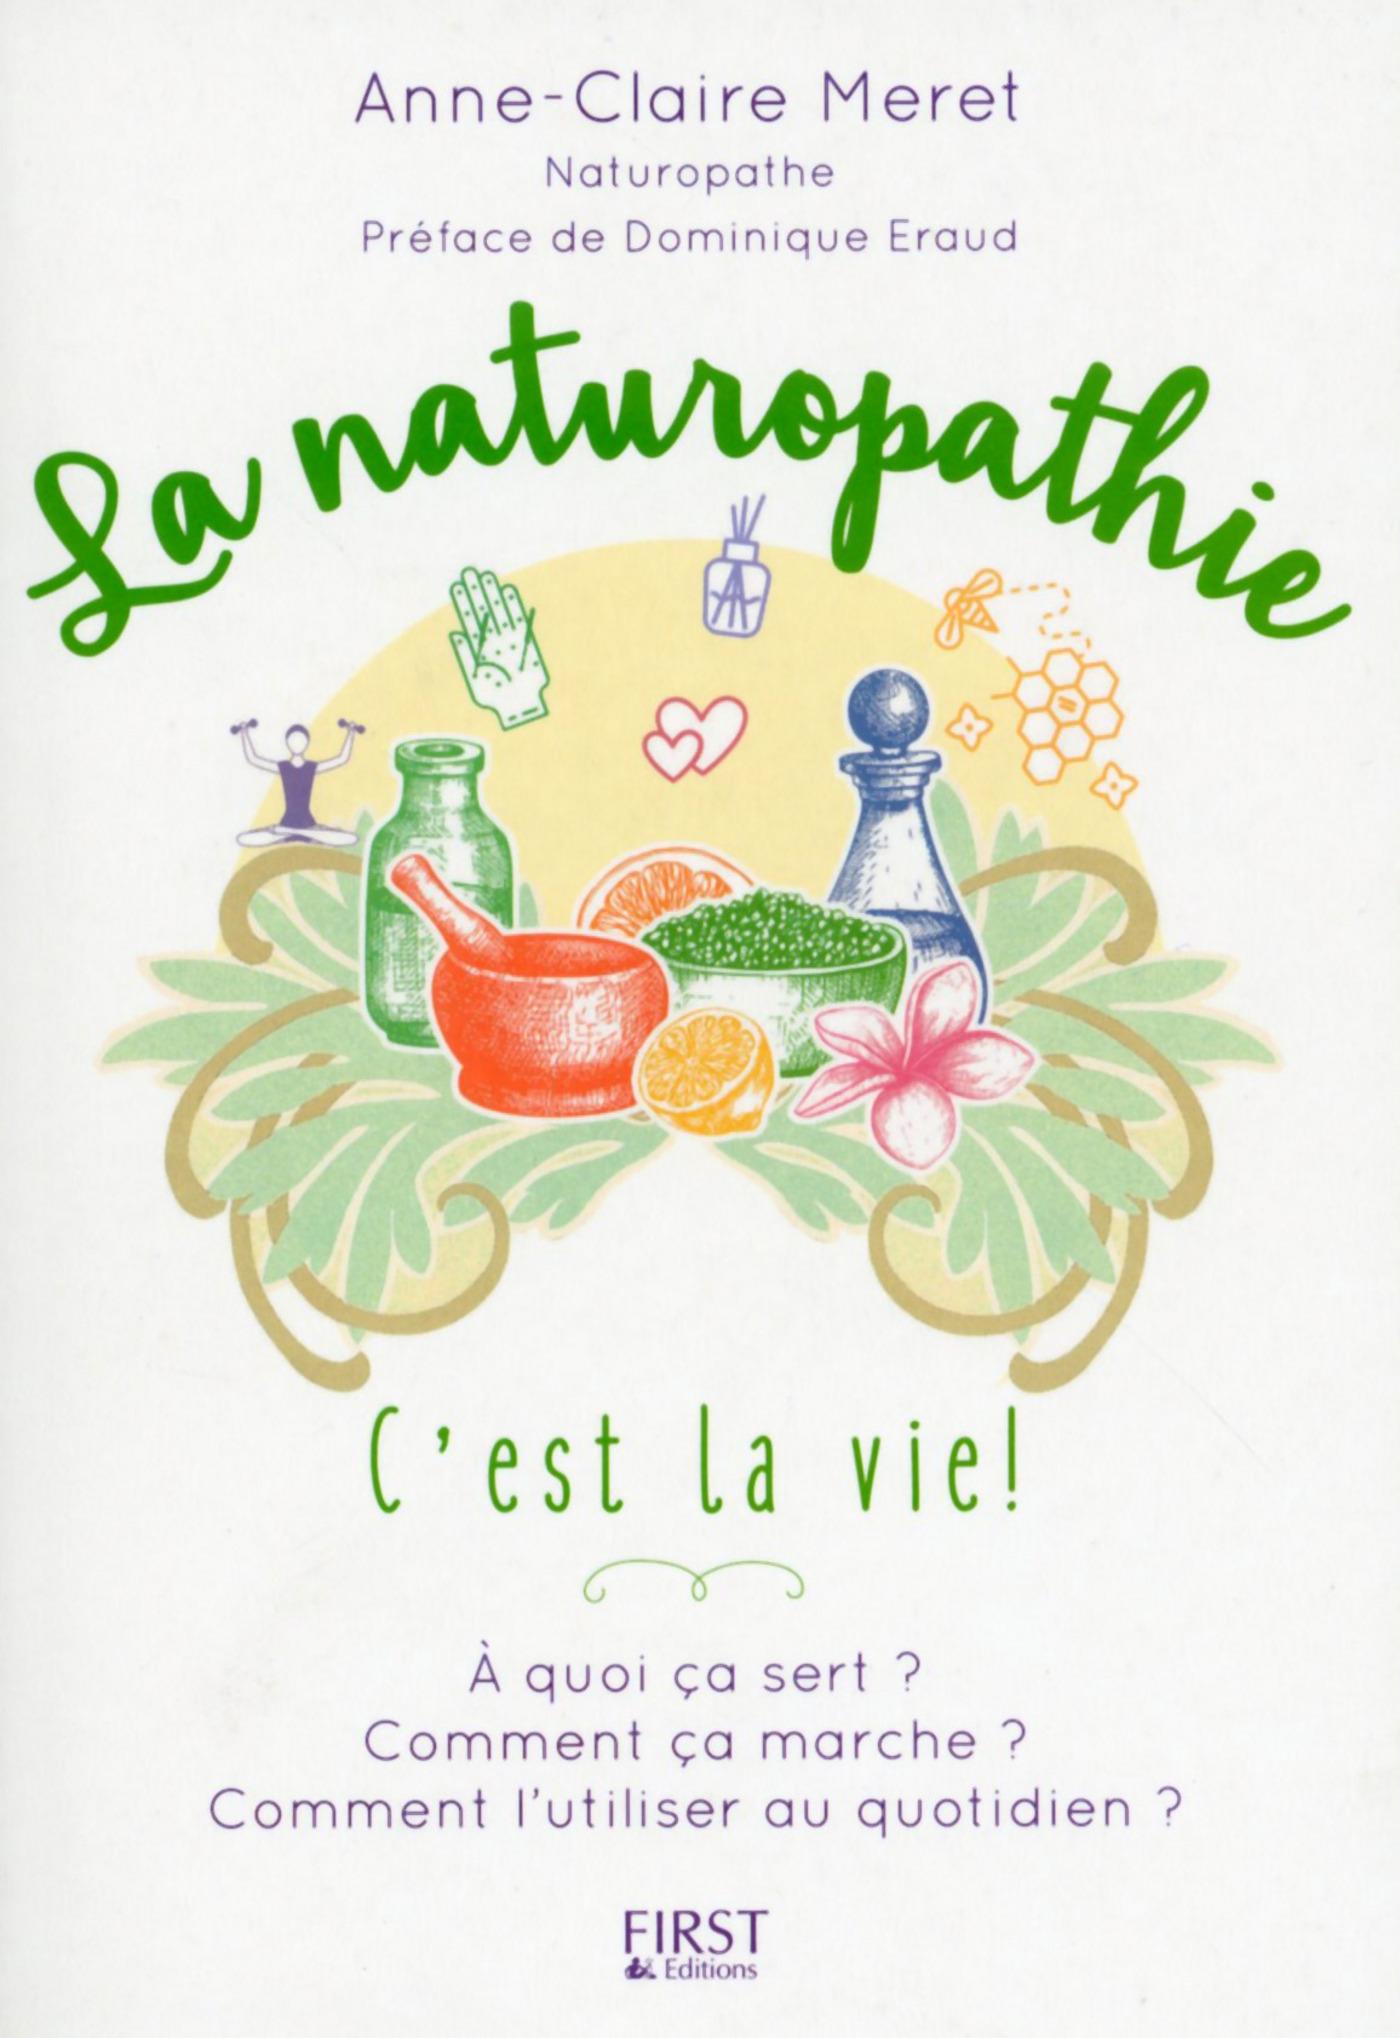 La Naturopathie c'est la vie !